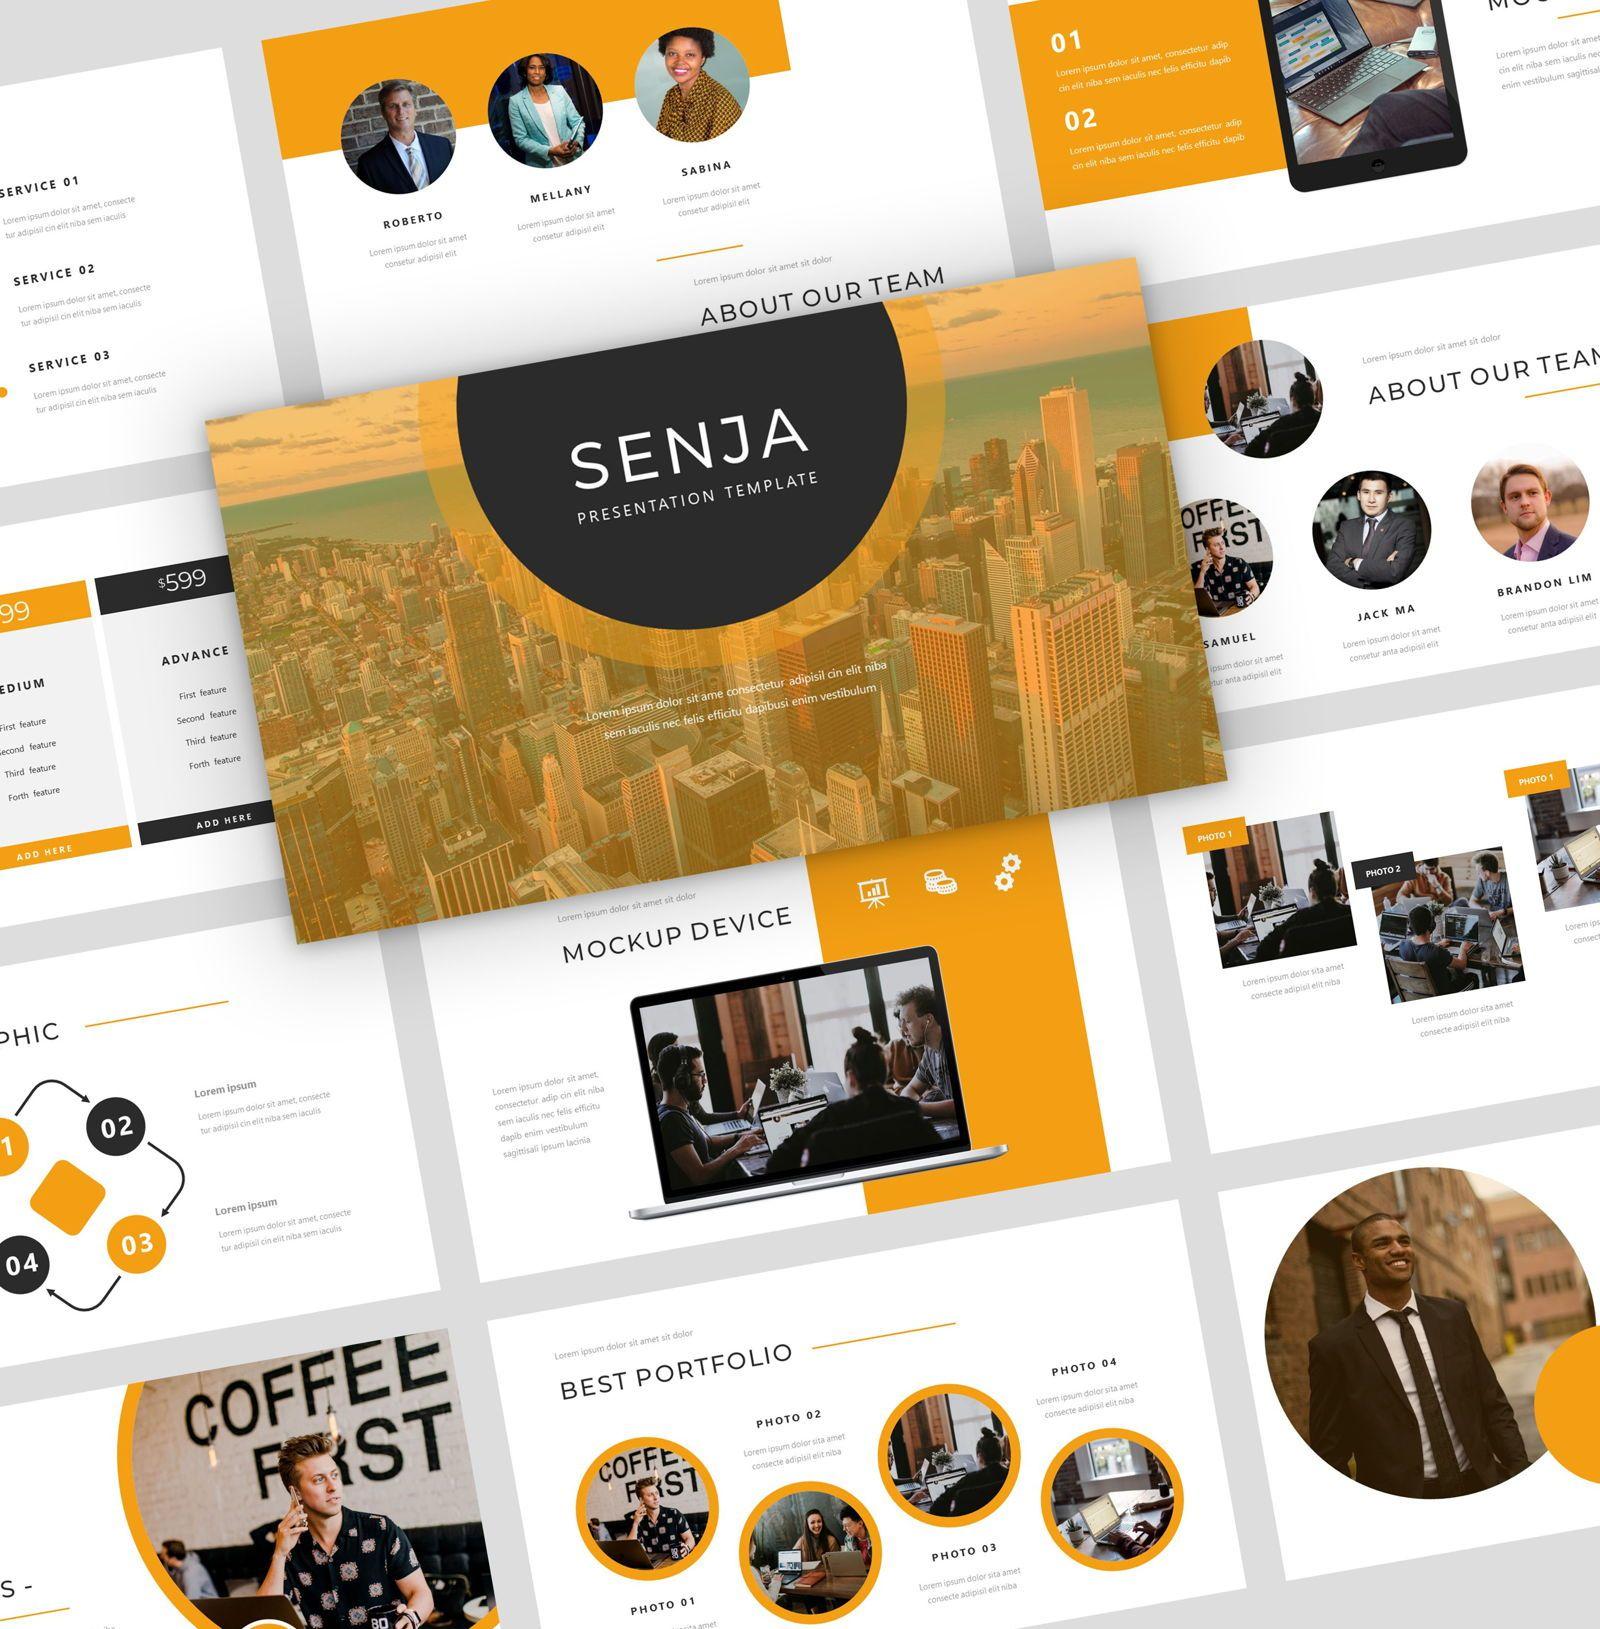 Senja - PowerPoint Presentation Template, 08074, Presentation Templates — PoweredTemplate.com